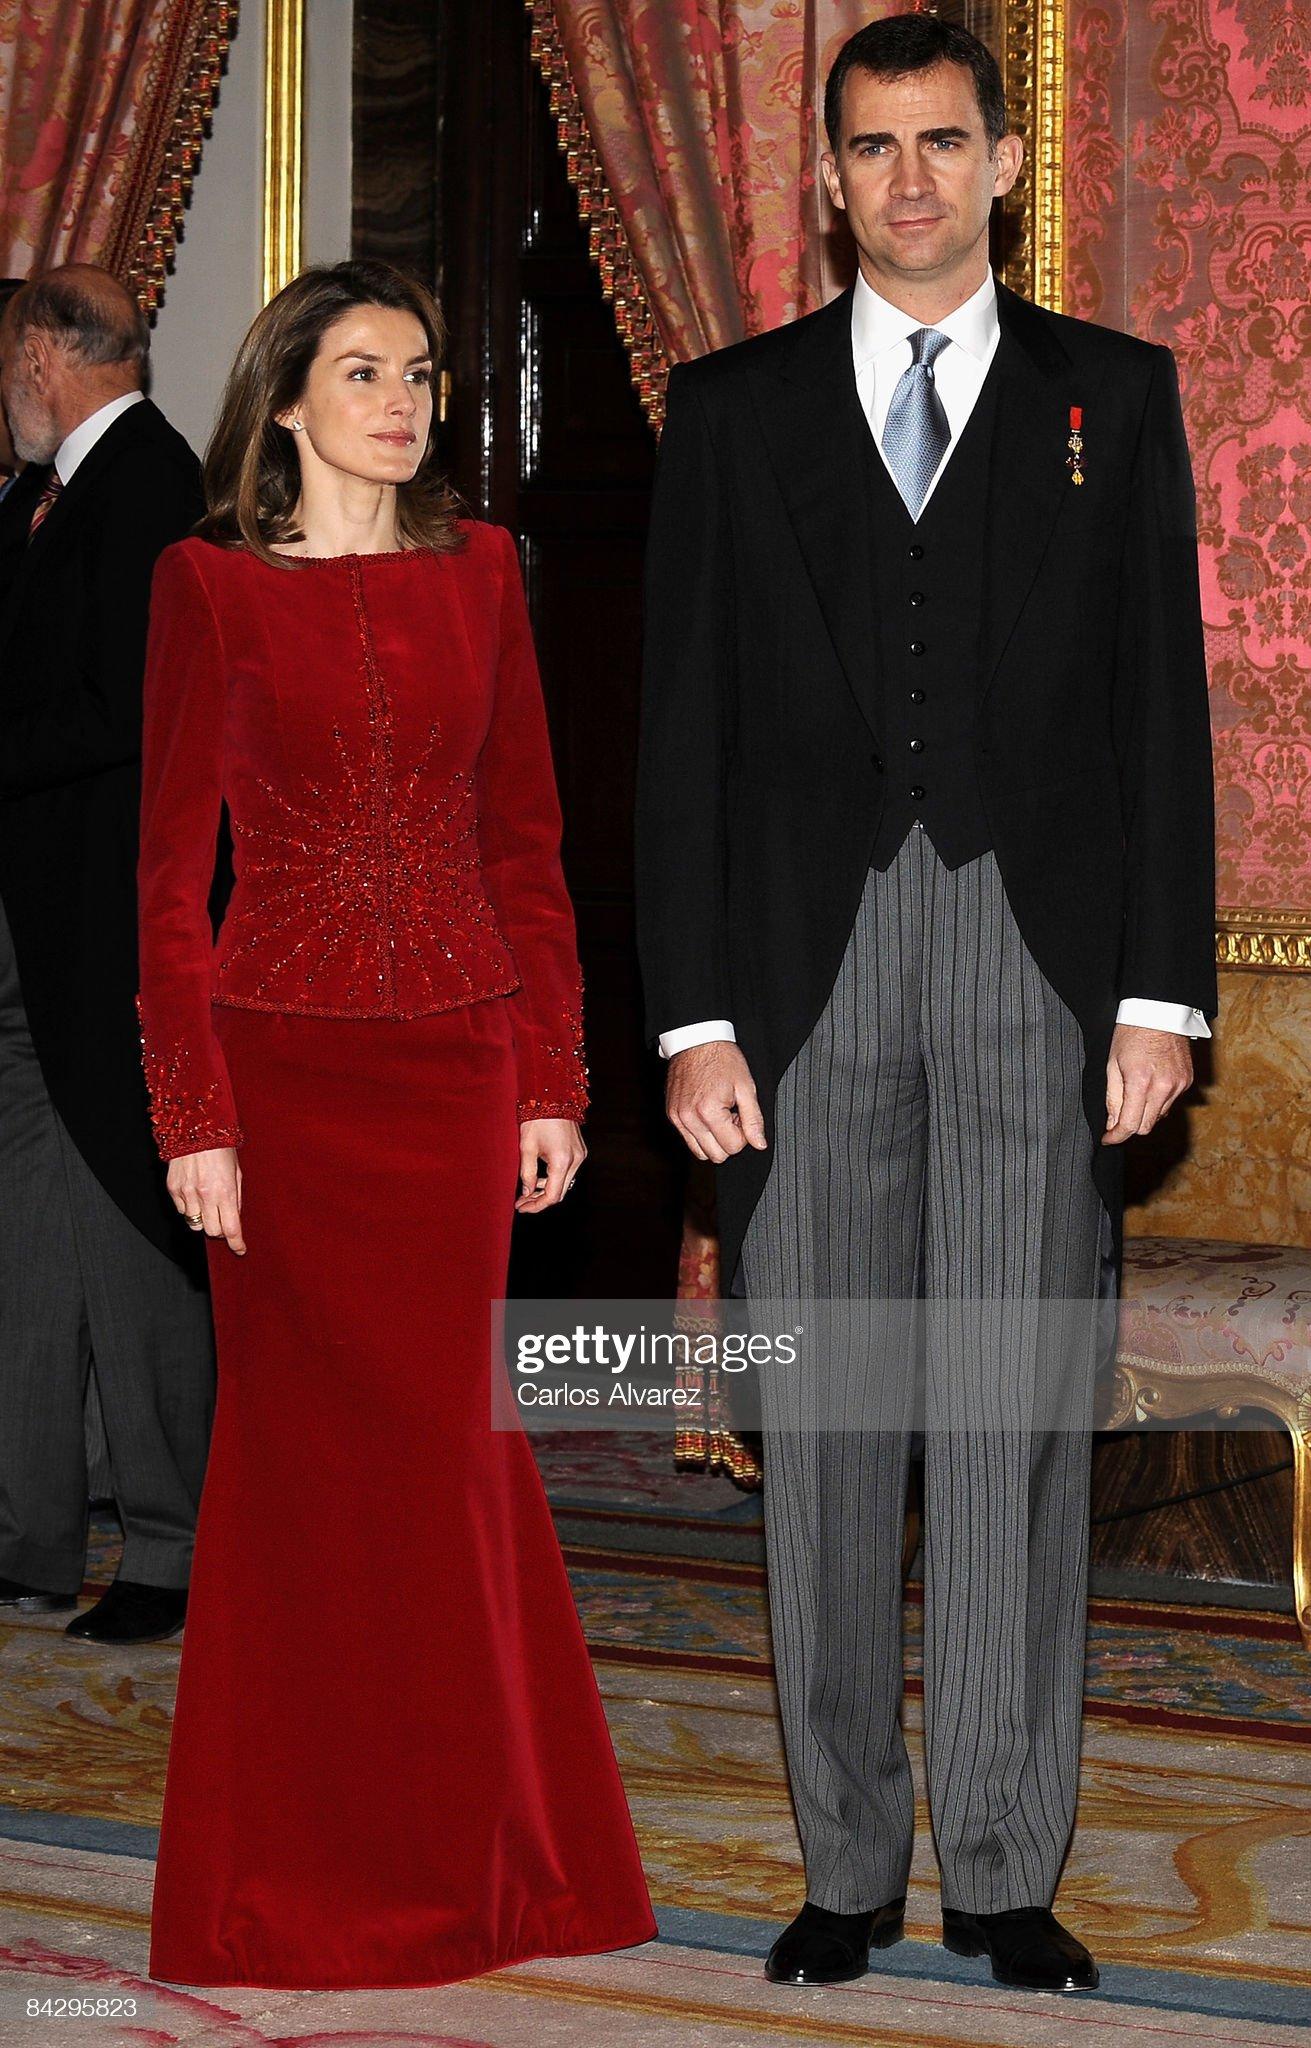 Spanish Royals Attend Zarzuela Palace : News Photo